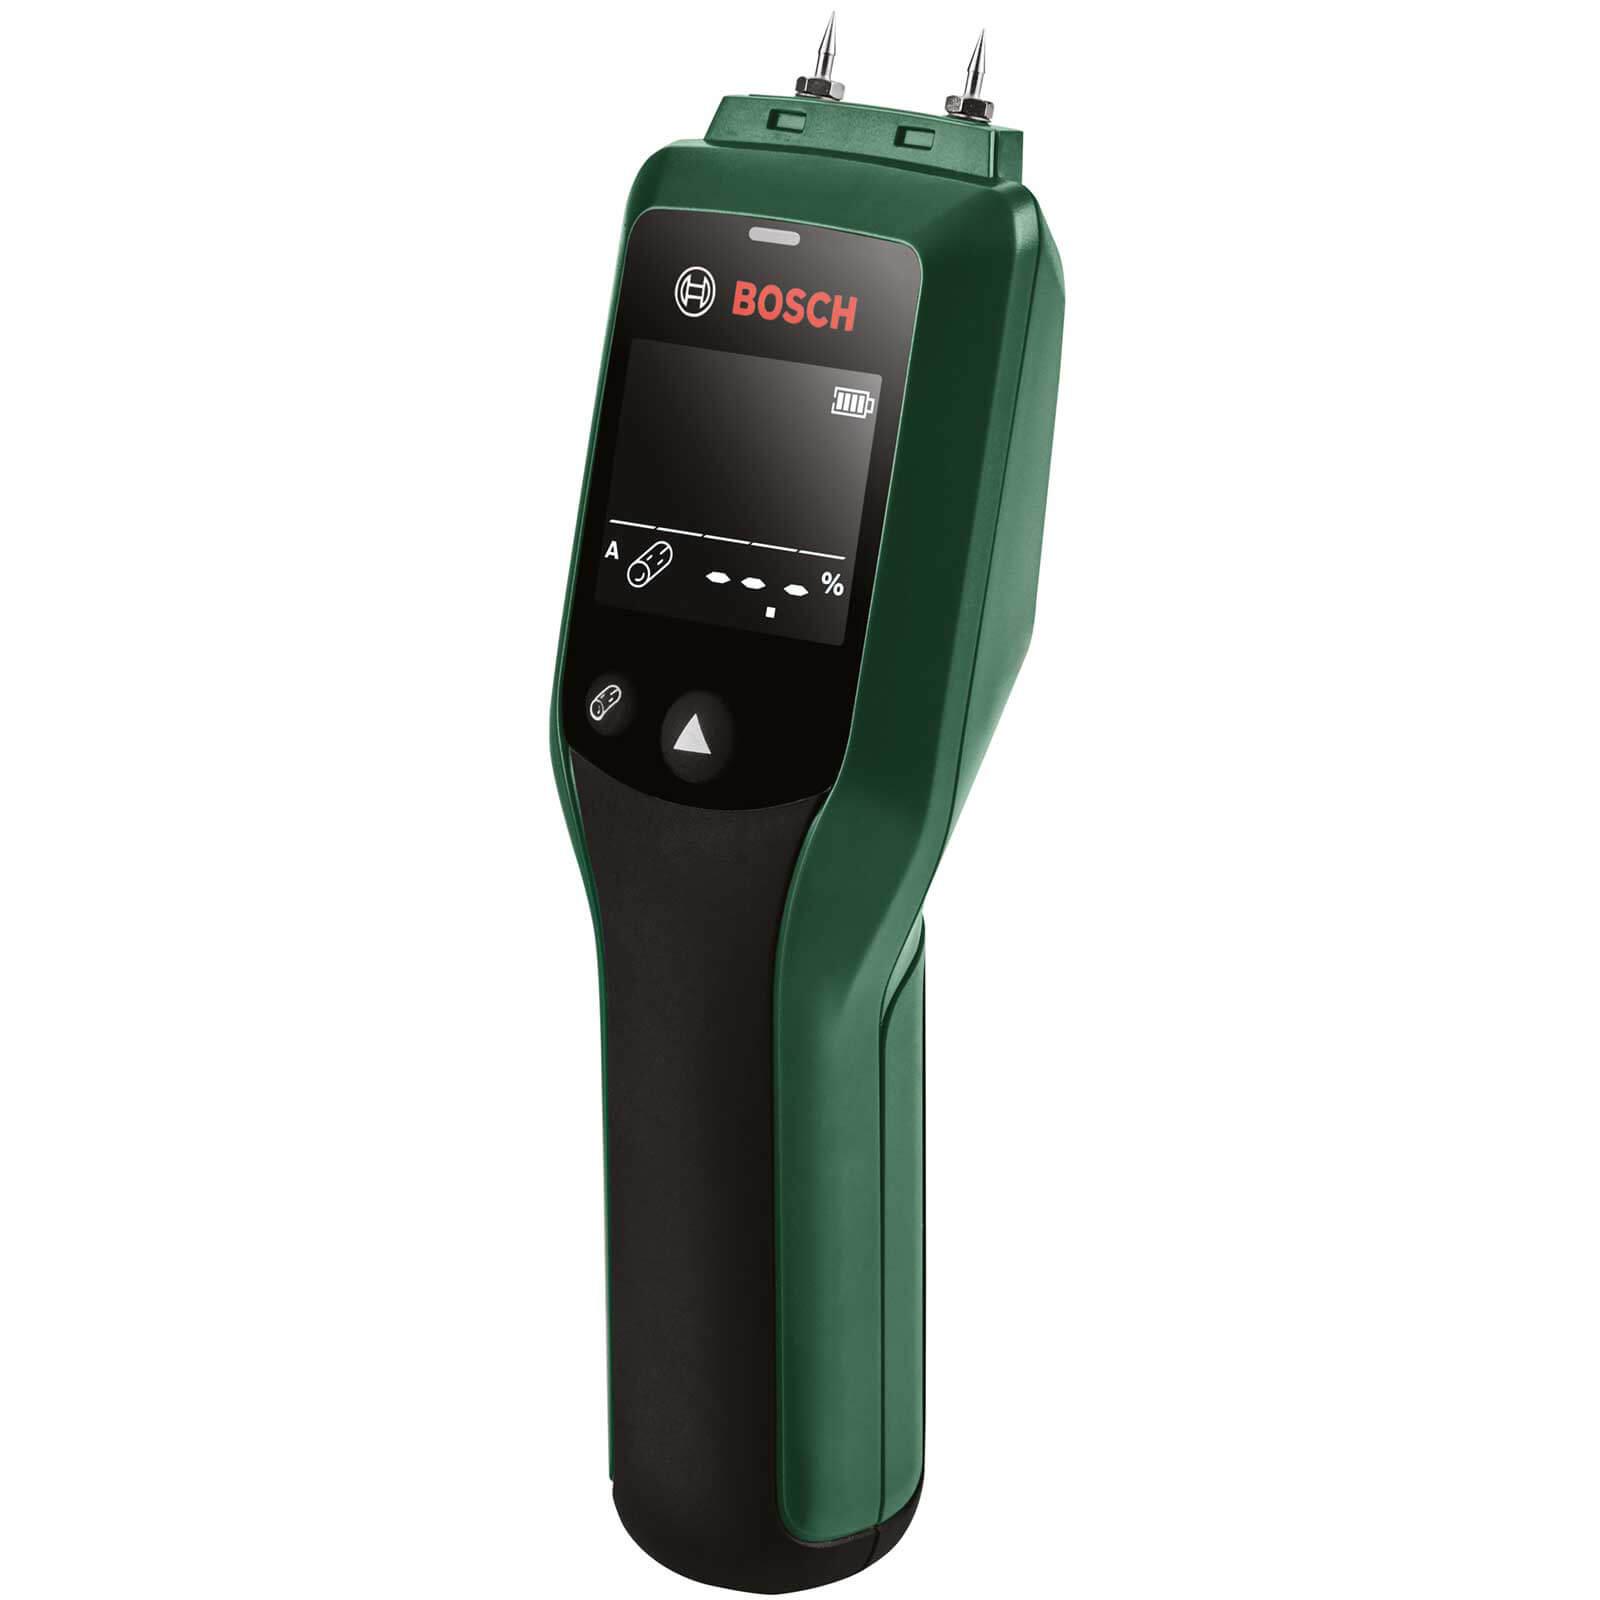 Bosch UNIVERSALHUMID Damp or Moisture Detector